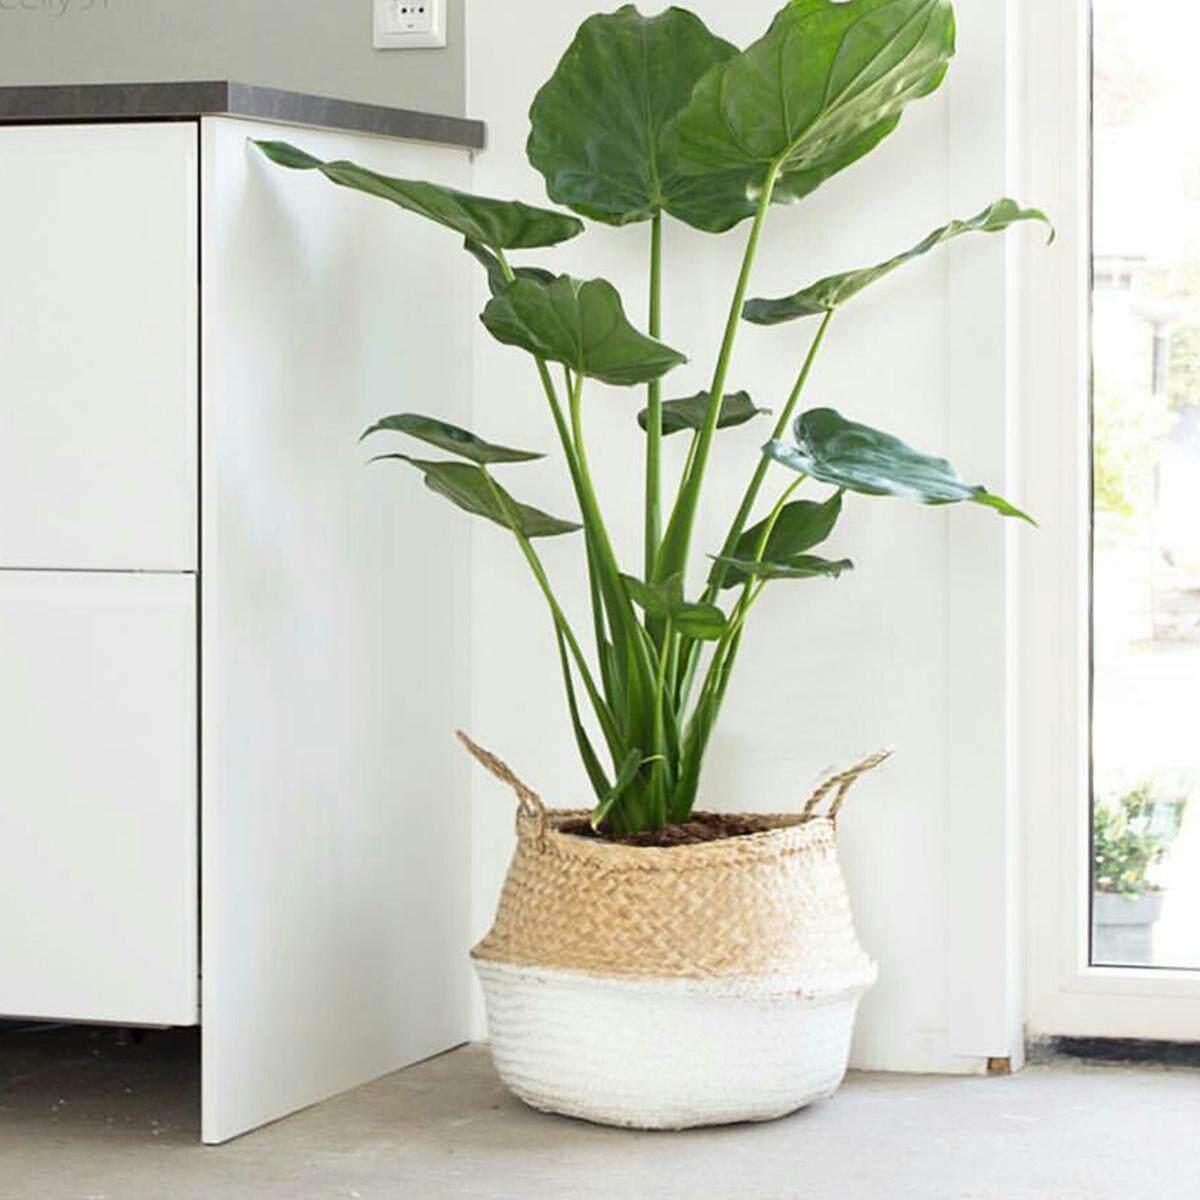 1Pcs Seagrass Belly Basket Storage Plant Pot Foldable Laundry Nursery Room Decor # White - intl